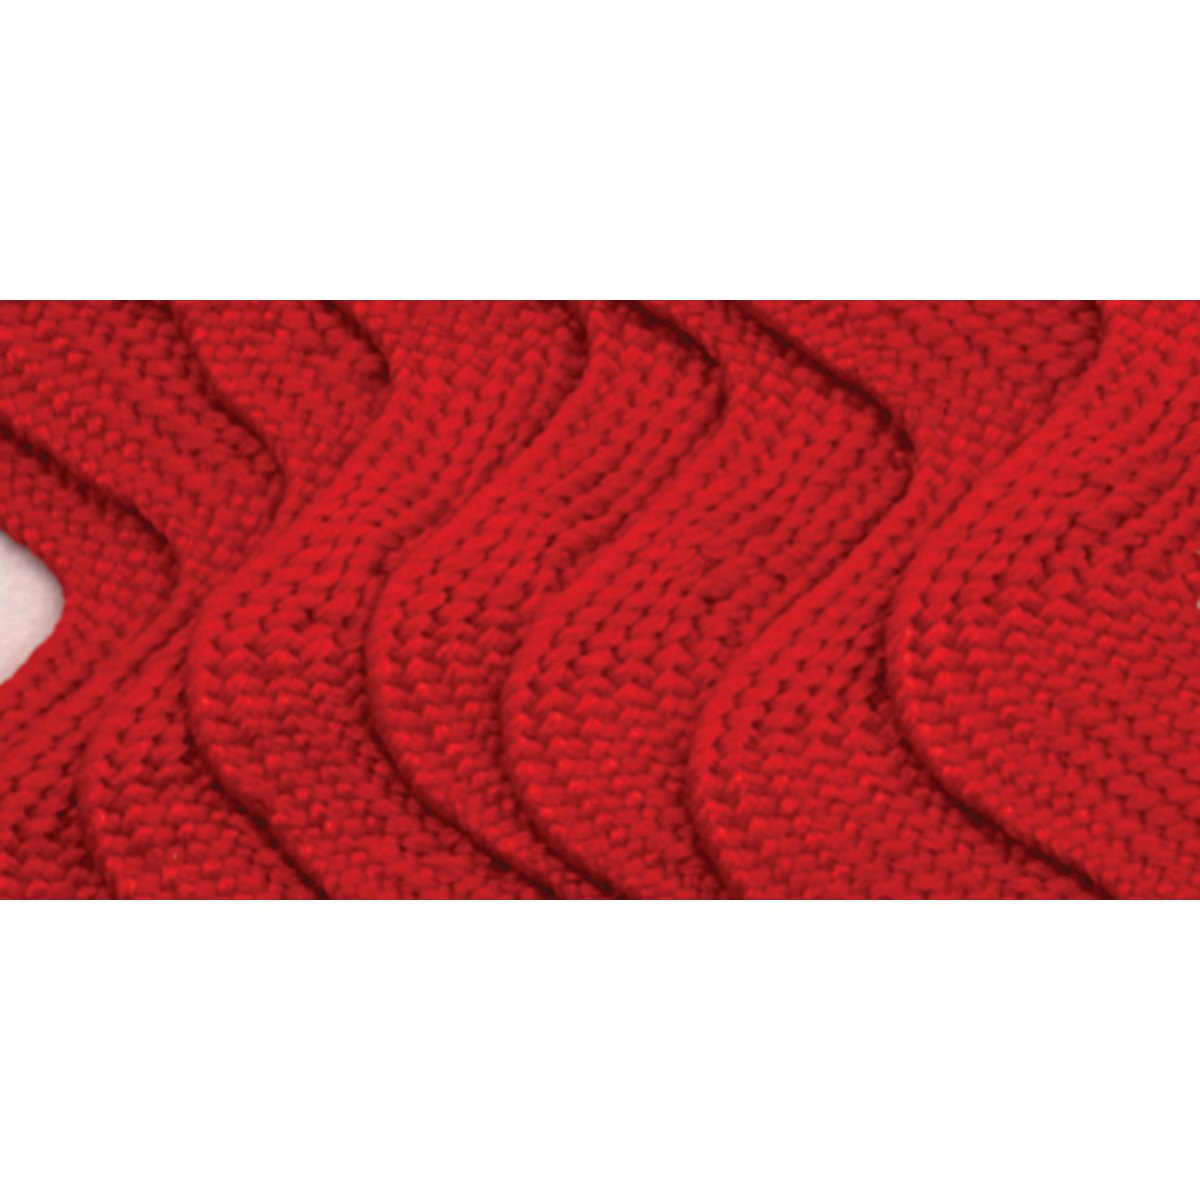 Scarlet 2.5-Yard Wrights 117-402-076 Polyester Rick Rack Trim Jumbo